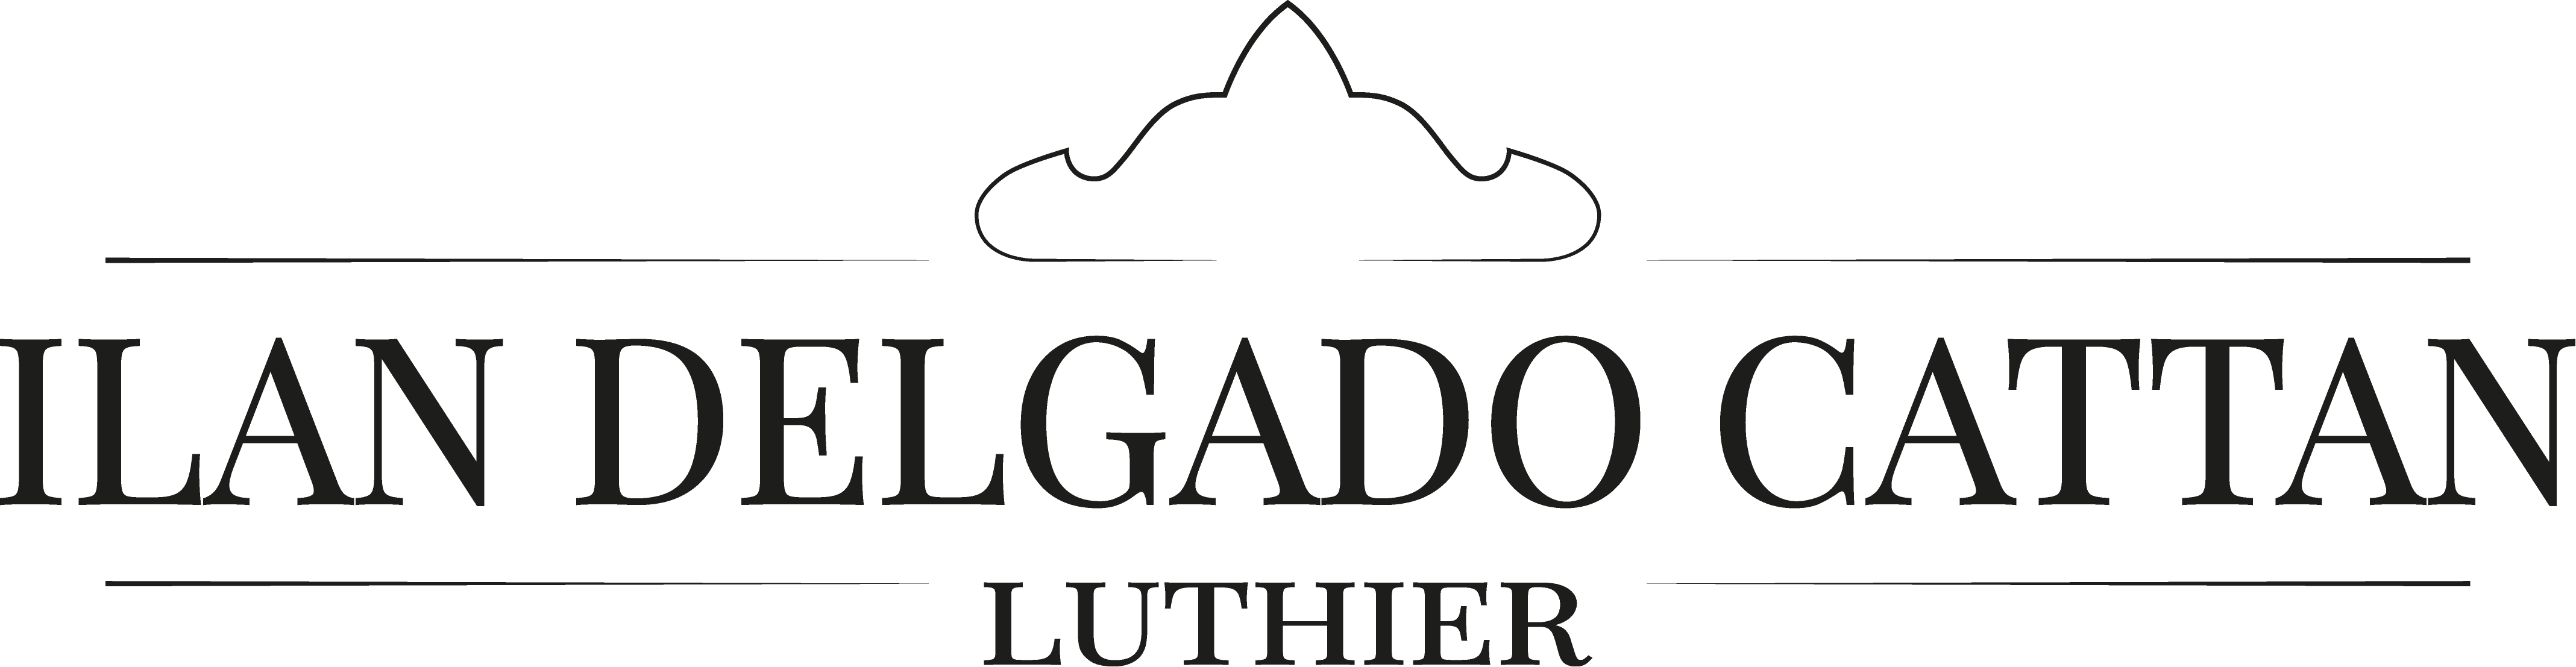 Ilan Delgado Cattan Luthier